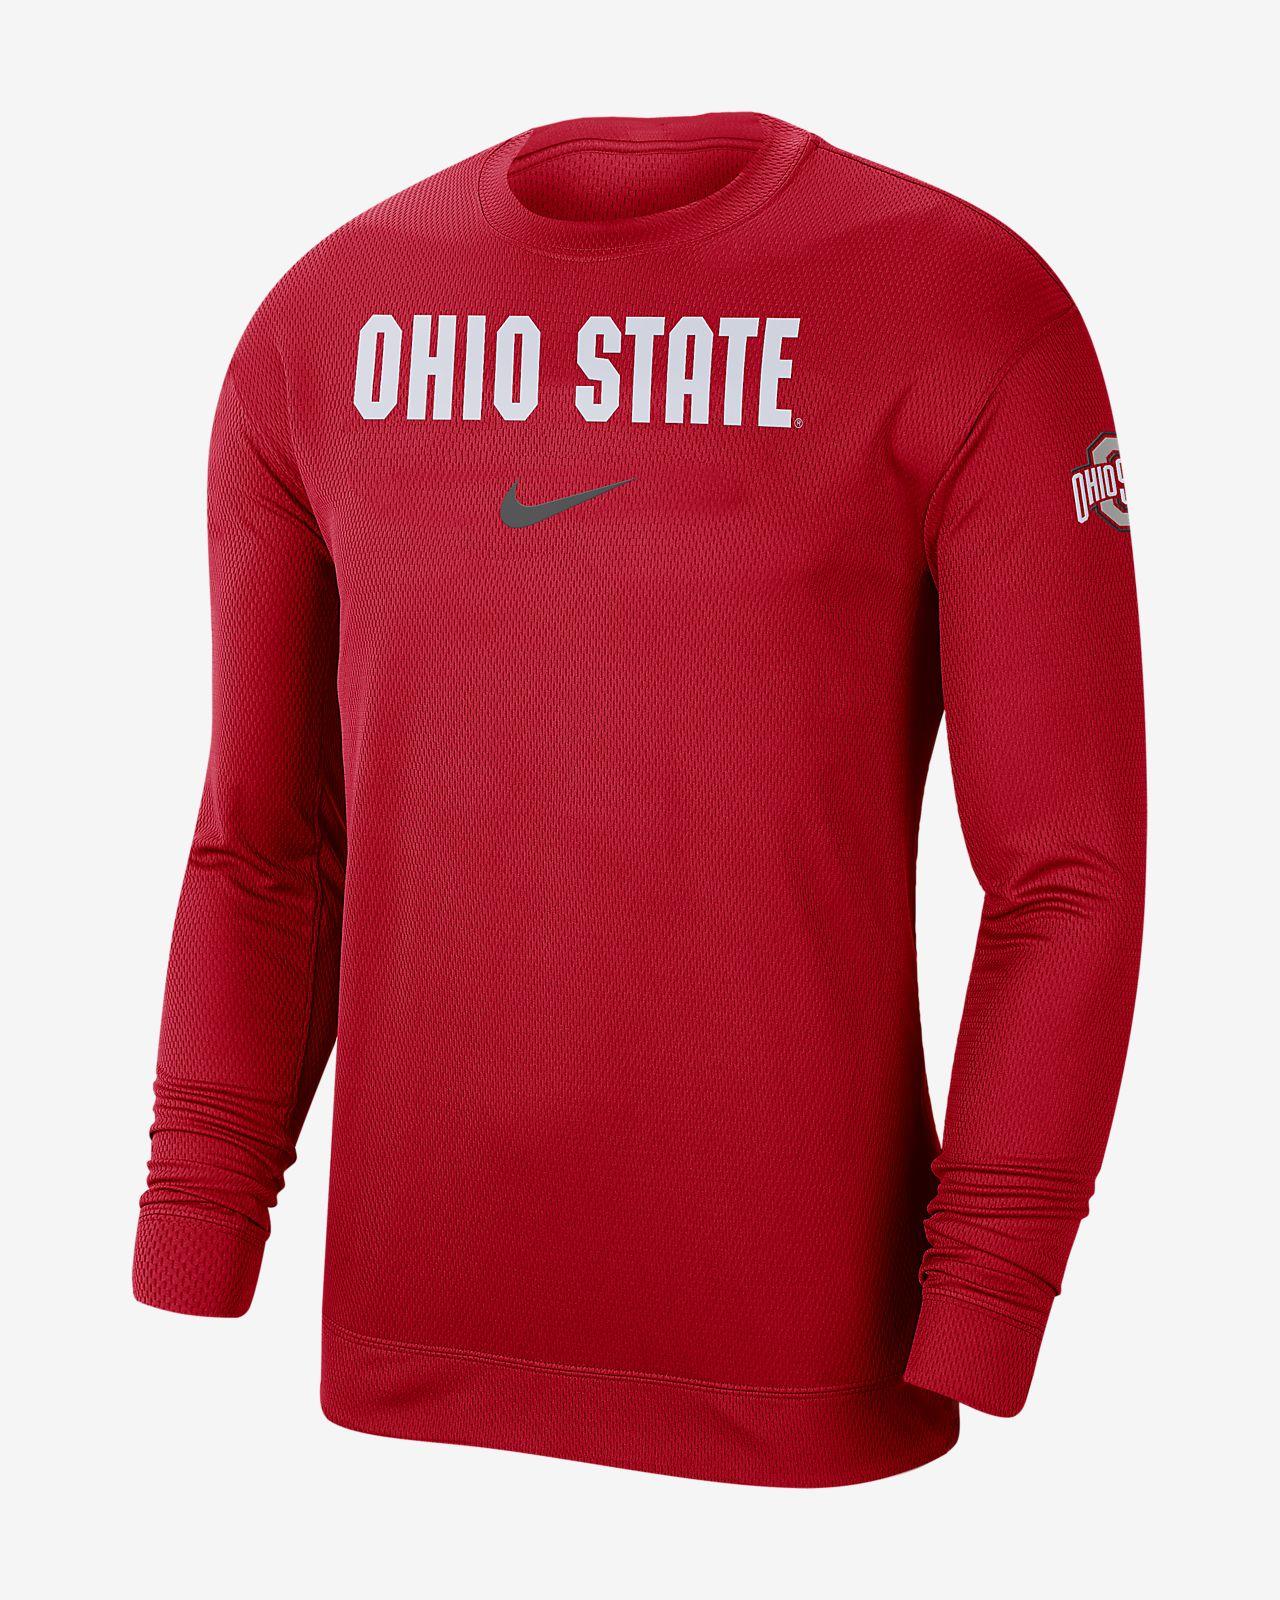 Nike College Dri-FIT Spotlight (Ohio State) Men's Long-Sleeve Top